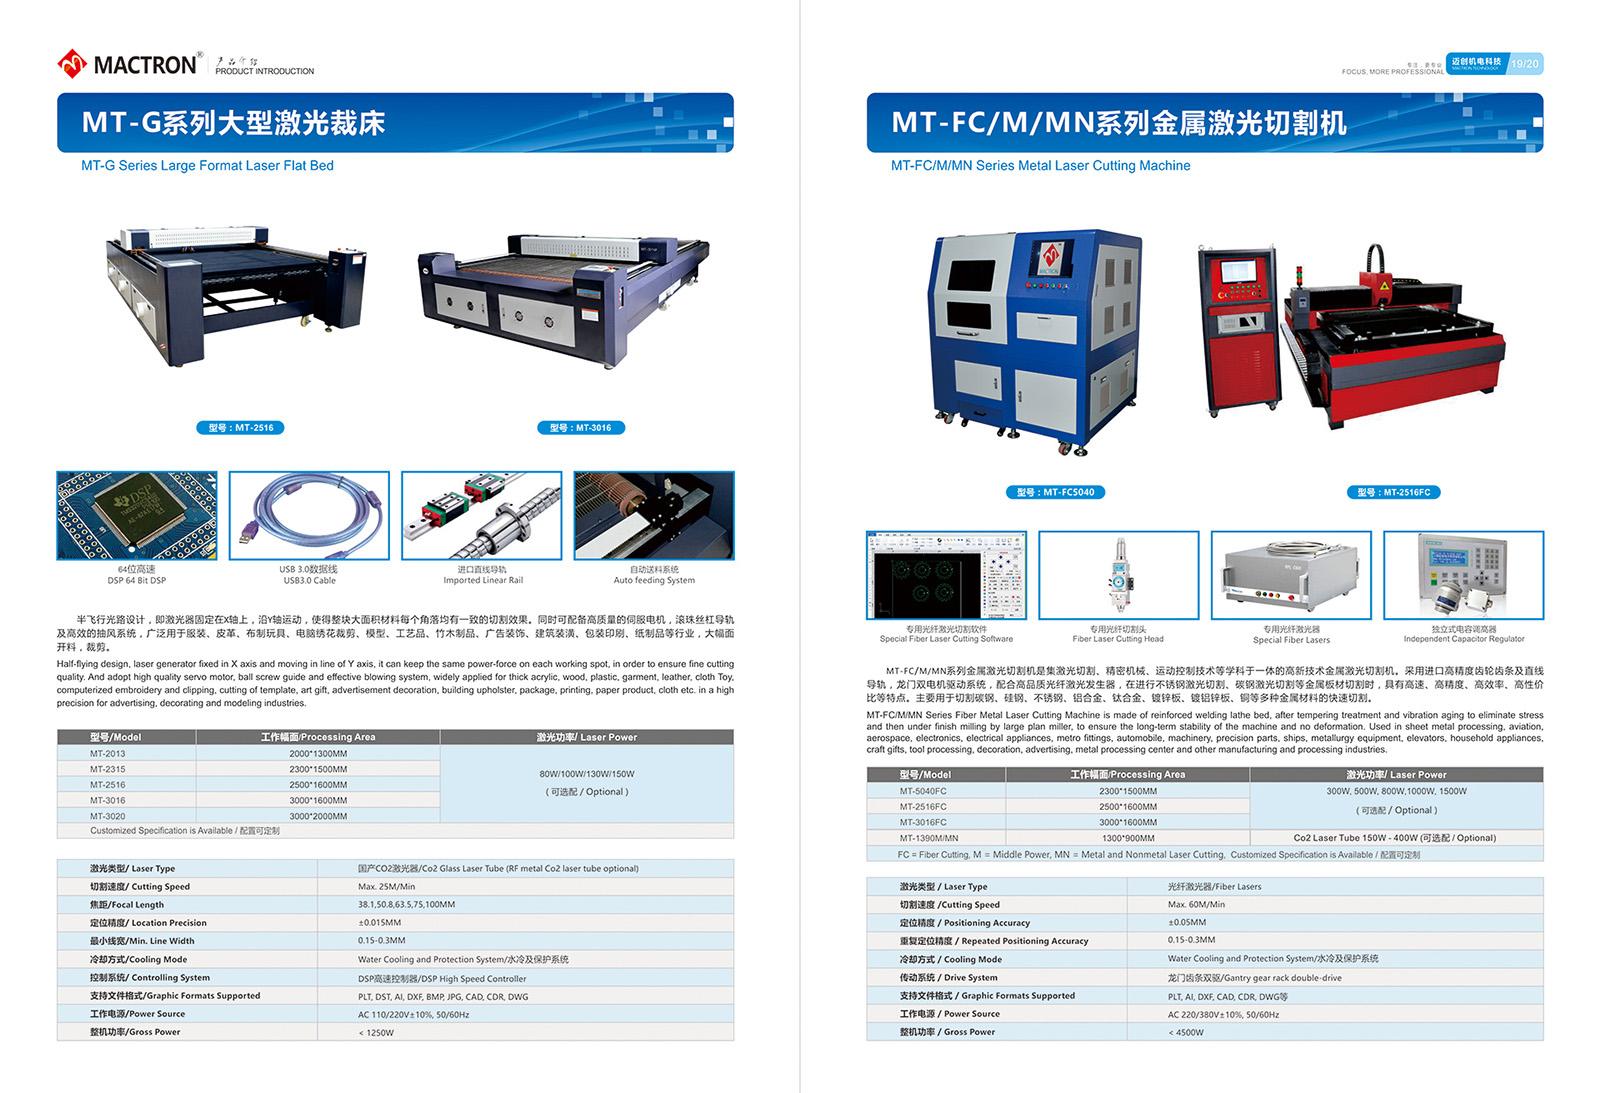 Mactron Tech Laser Catalogue 2017 (11)